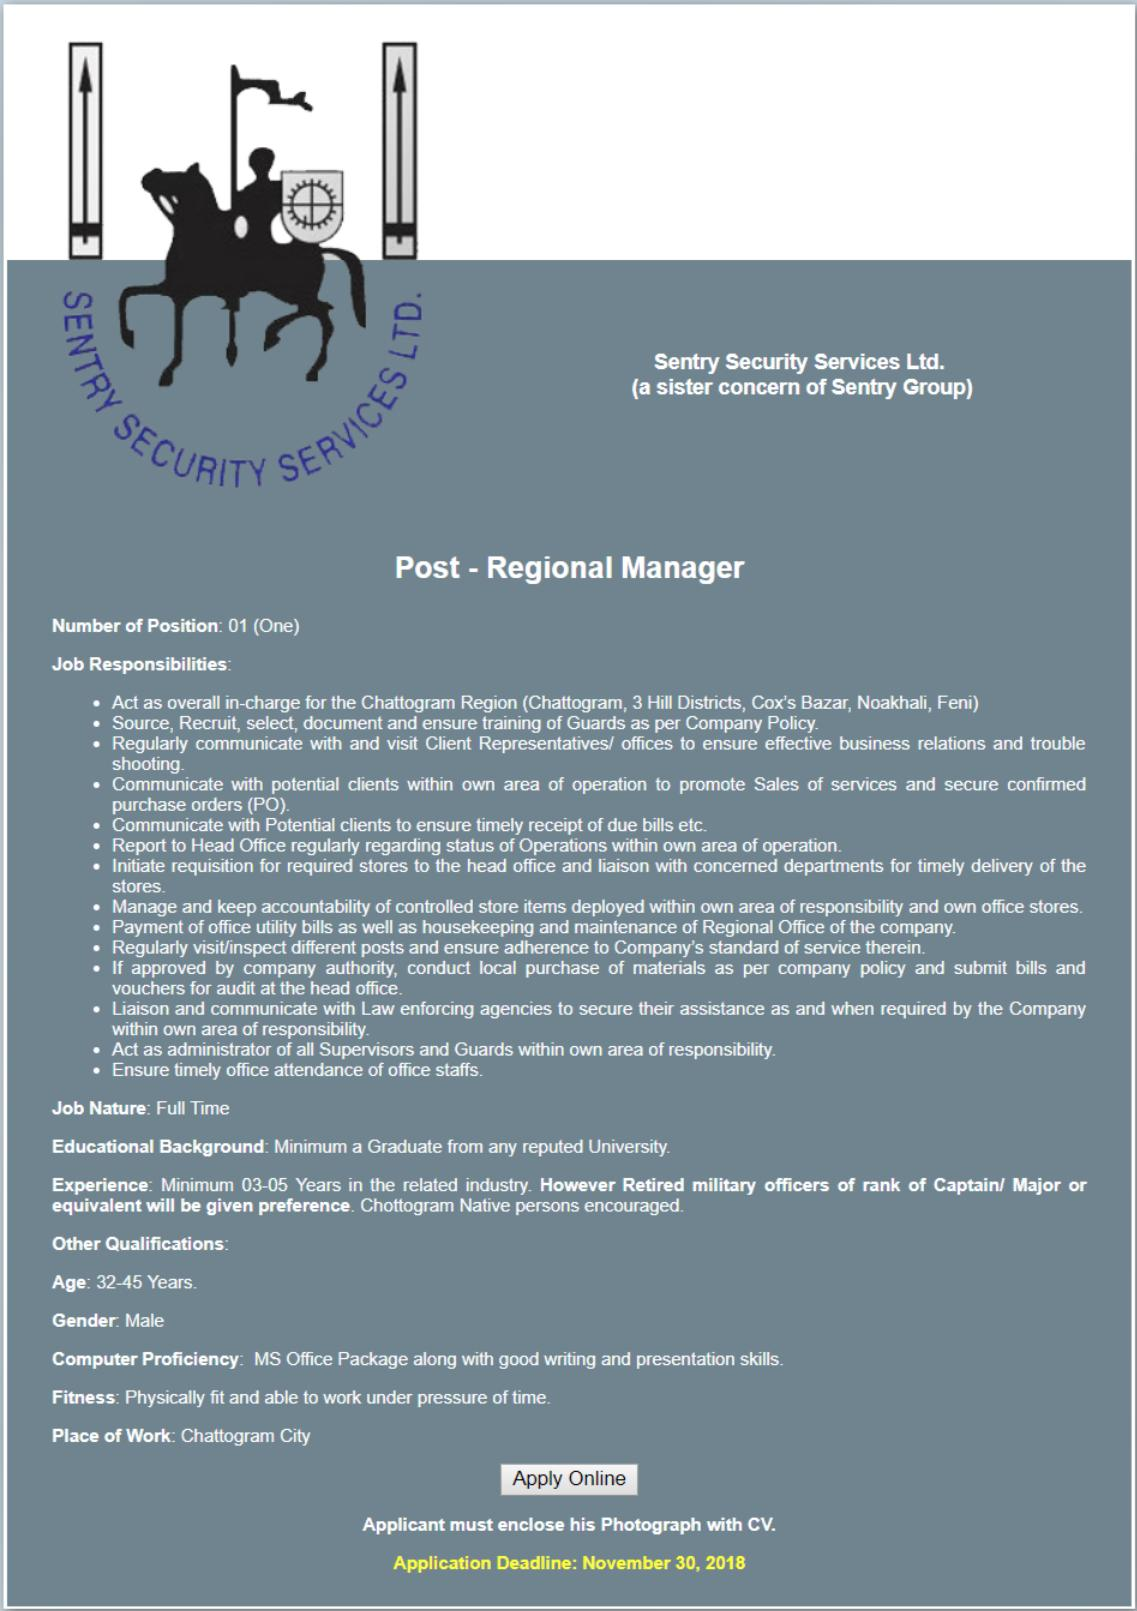 Sentry Security Services Ltd Job Circular